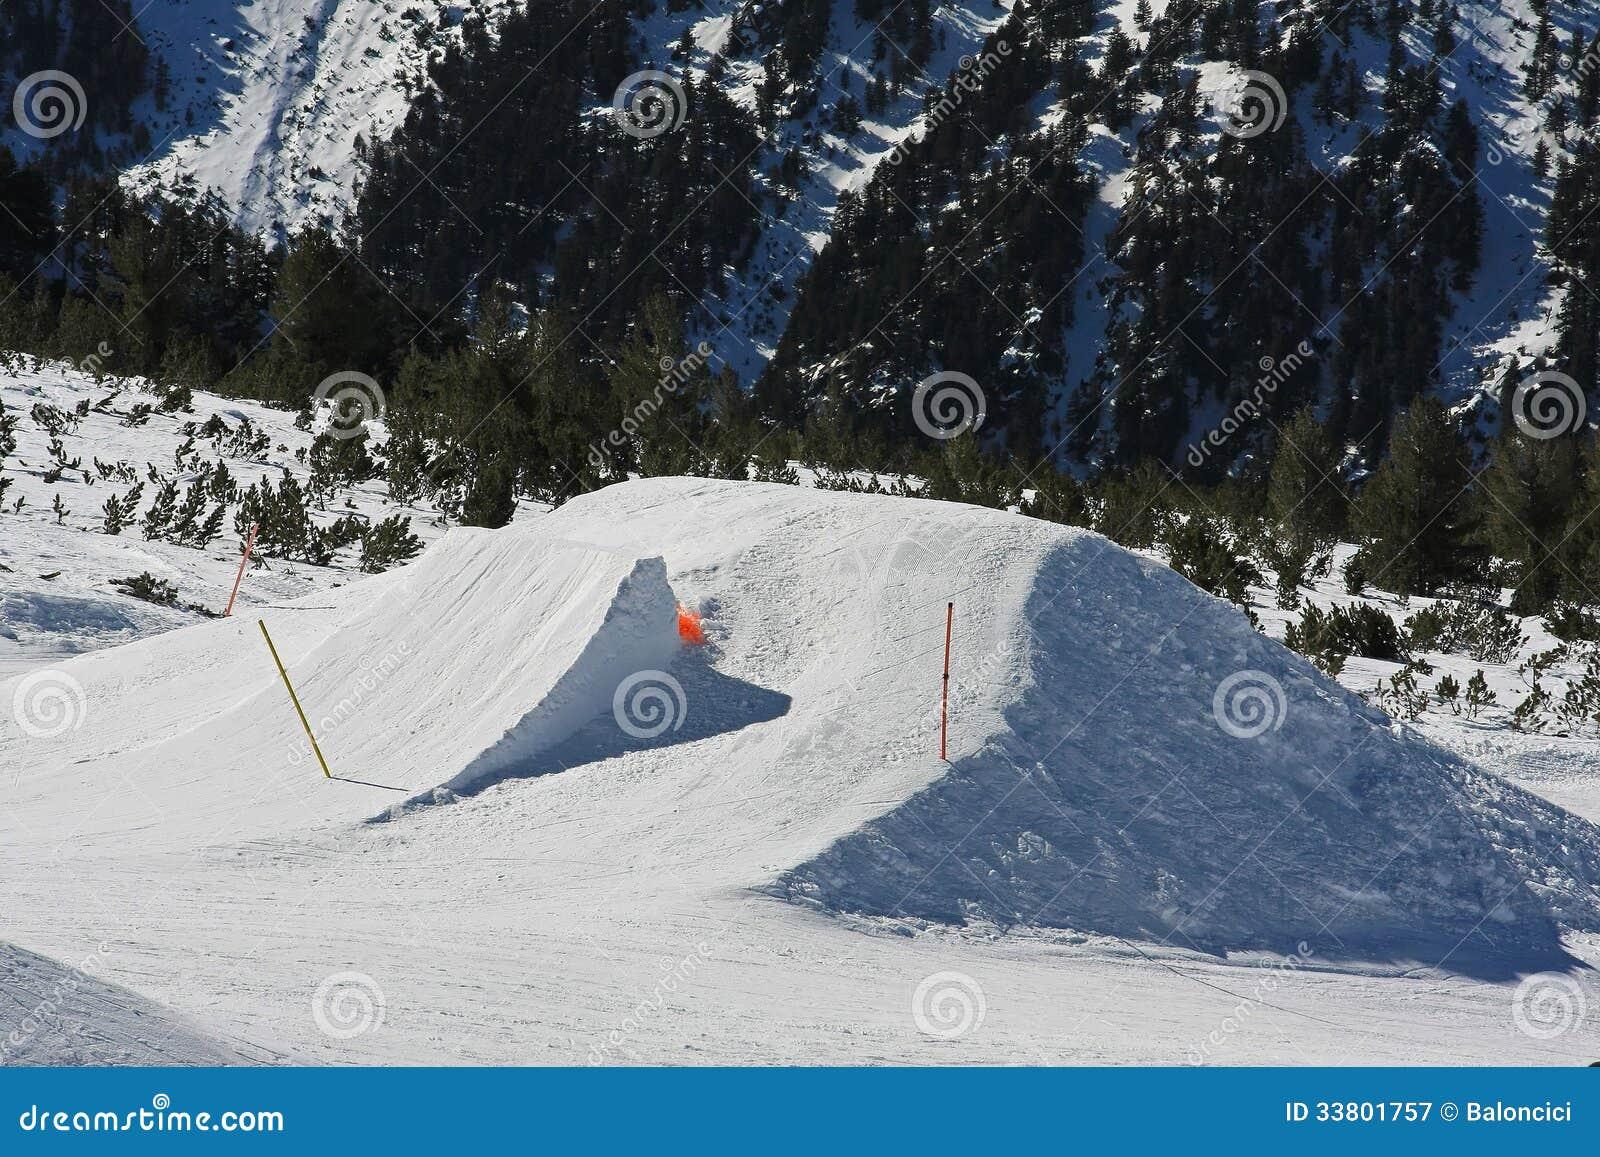 Backyard Snowboard Ramp snowboarding jump ramp stock image. image of drop, ramps - 33801757